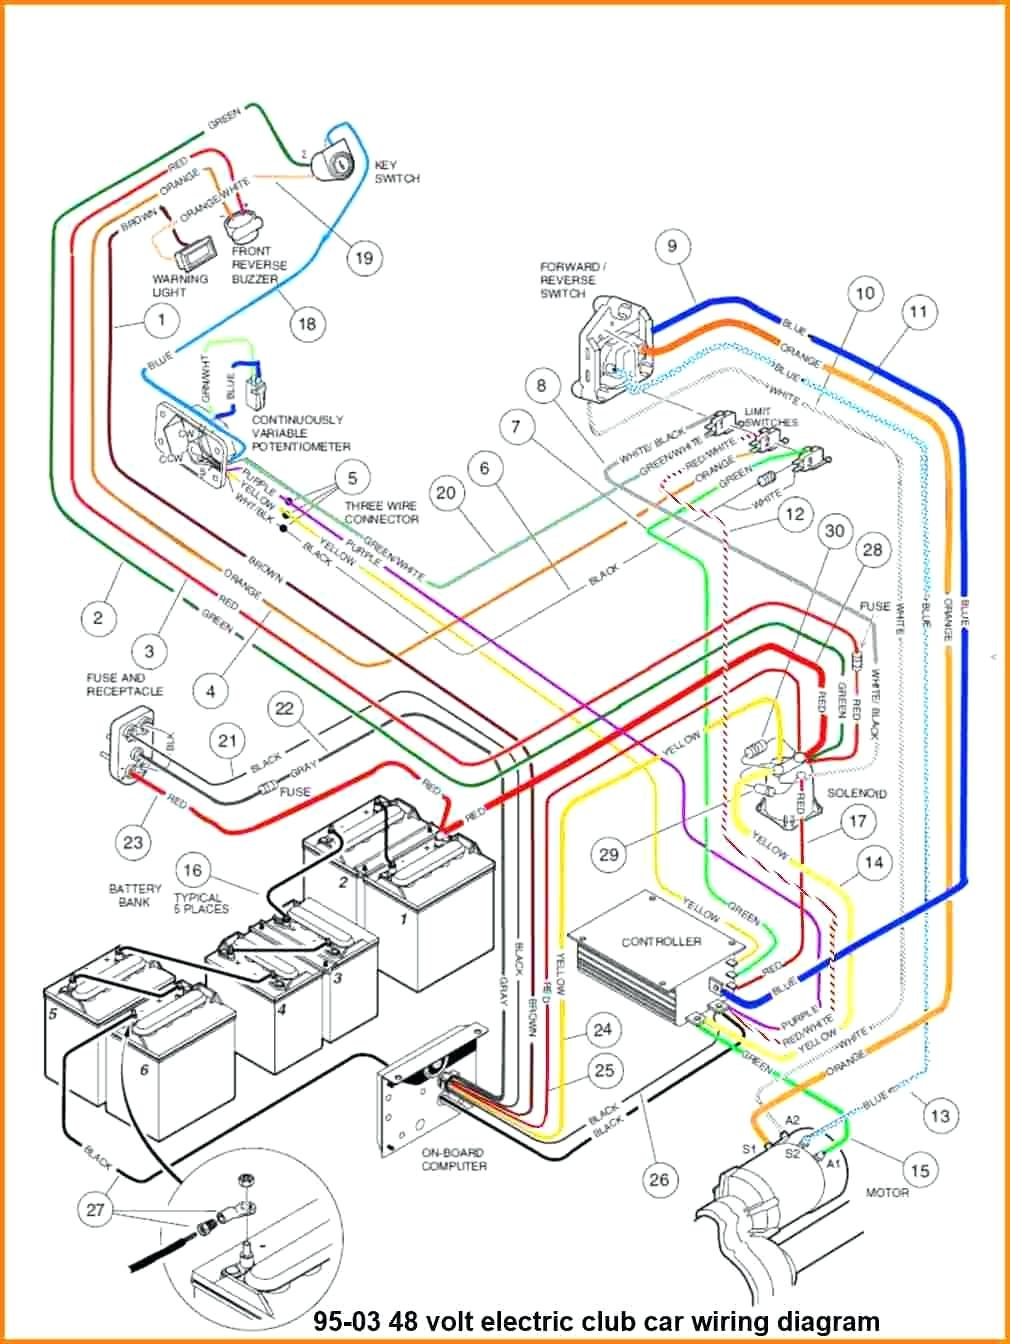 36 Volt Wiring Diagram - Wiring Diagrams - 36 Volt Golf Cart Wiring Diagram